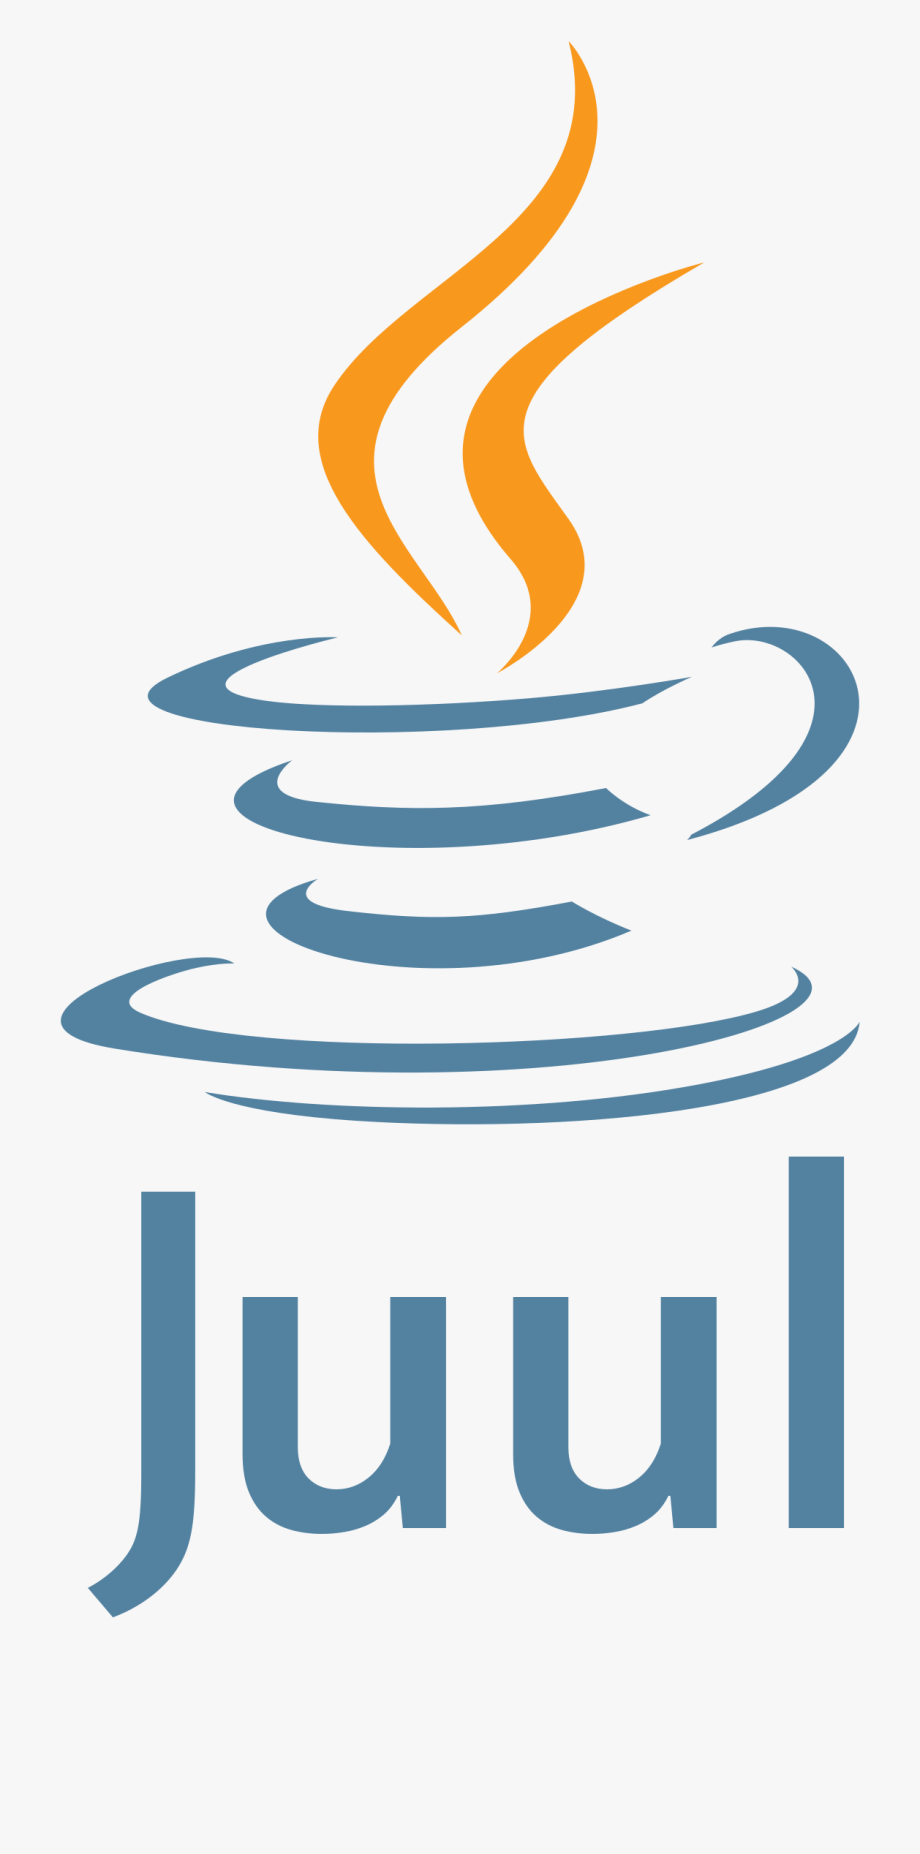 Java Logo Transparent Background , Transparent Cartoon, Free.